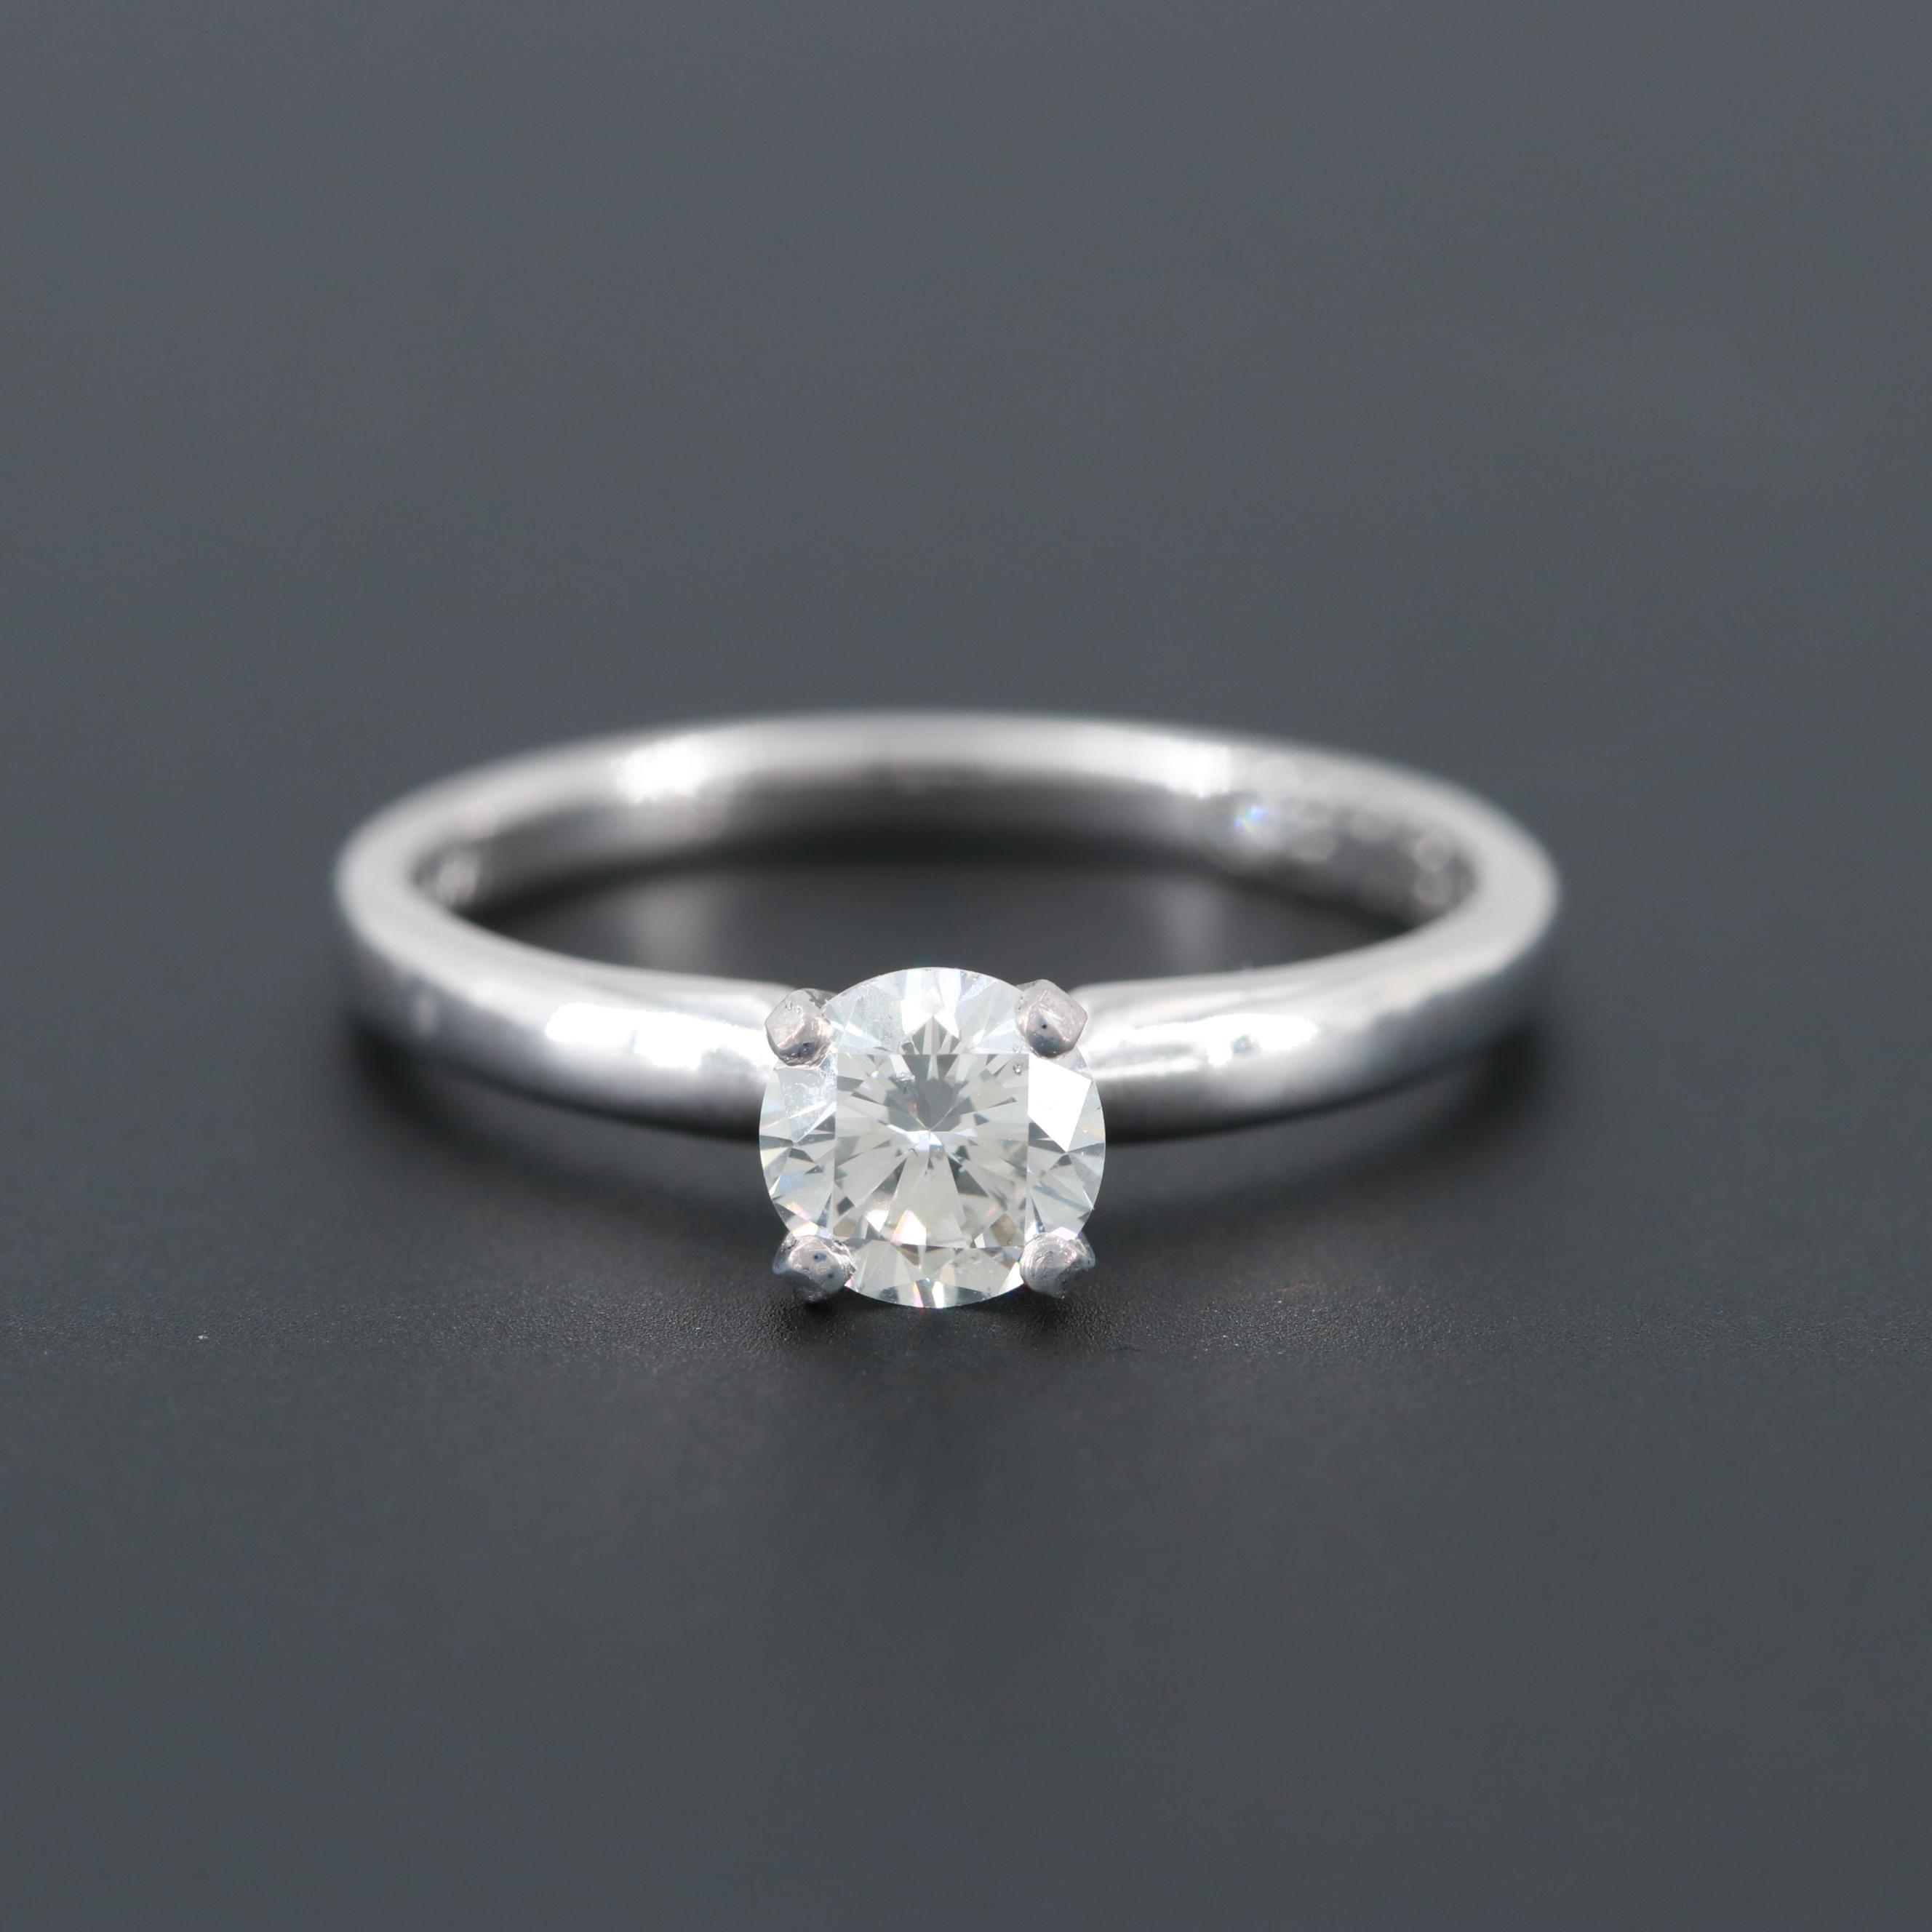 14K White Gold and Platinum Diamond Ring